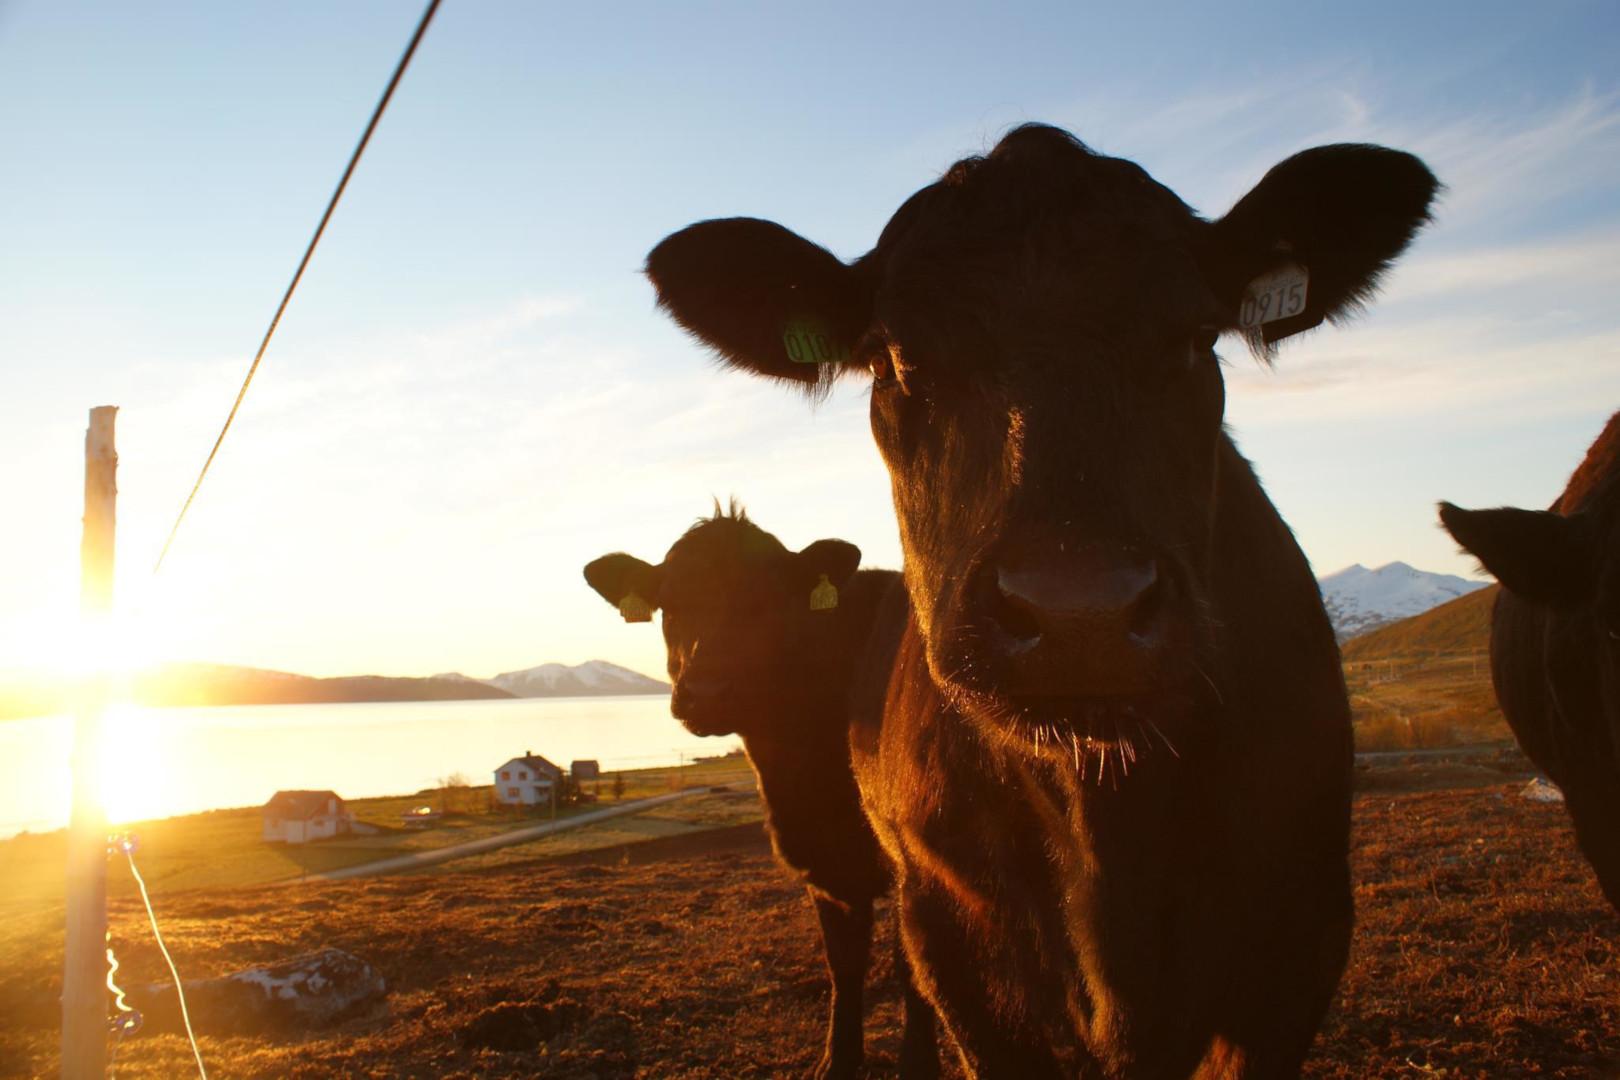 Visit-Karlsøy_4_cows_Bull-Gård1620.jpg